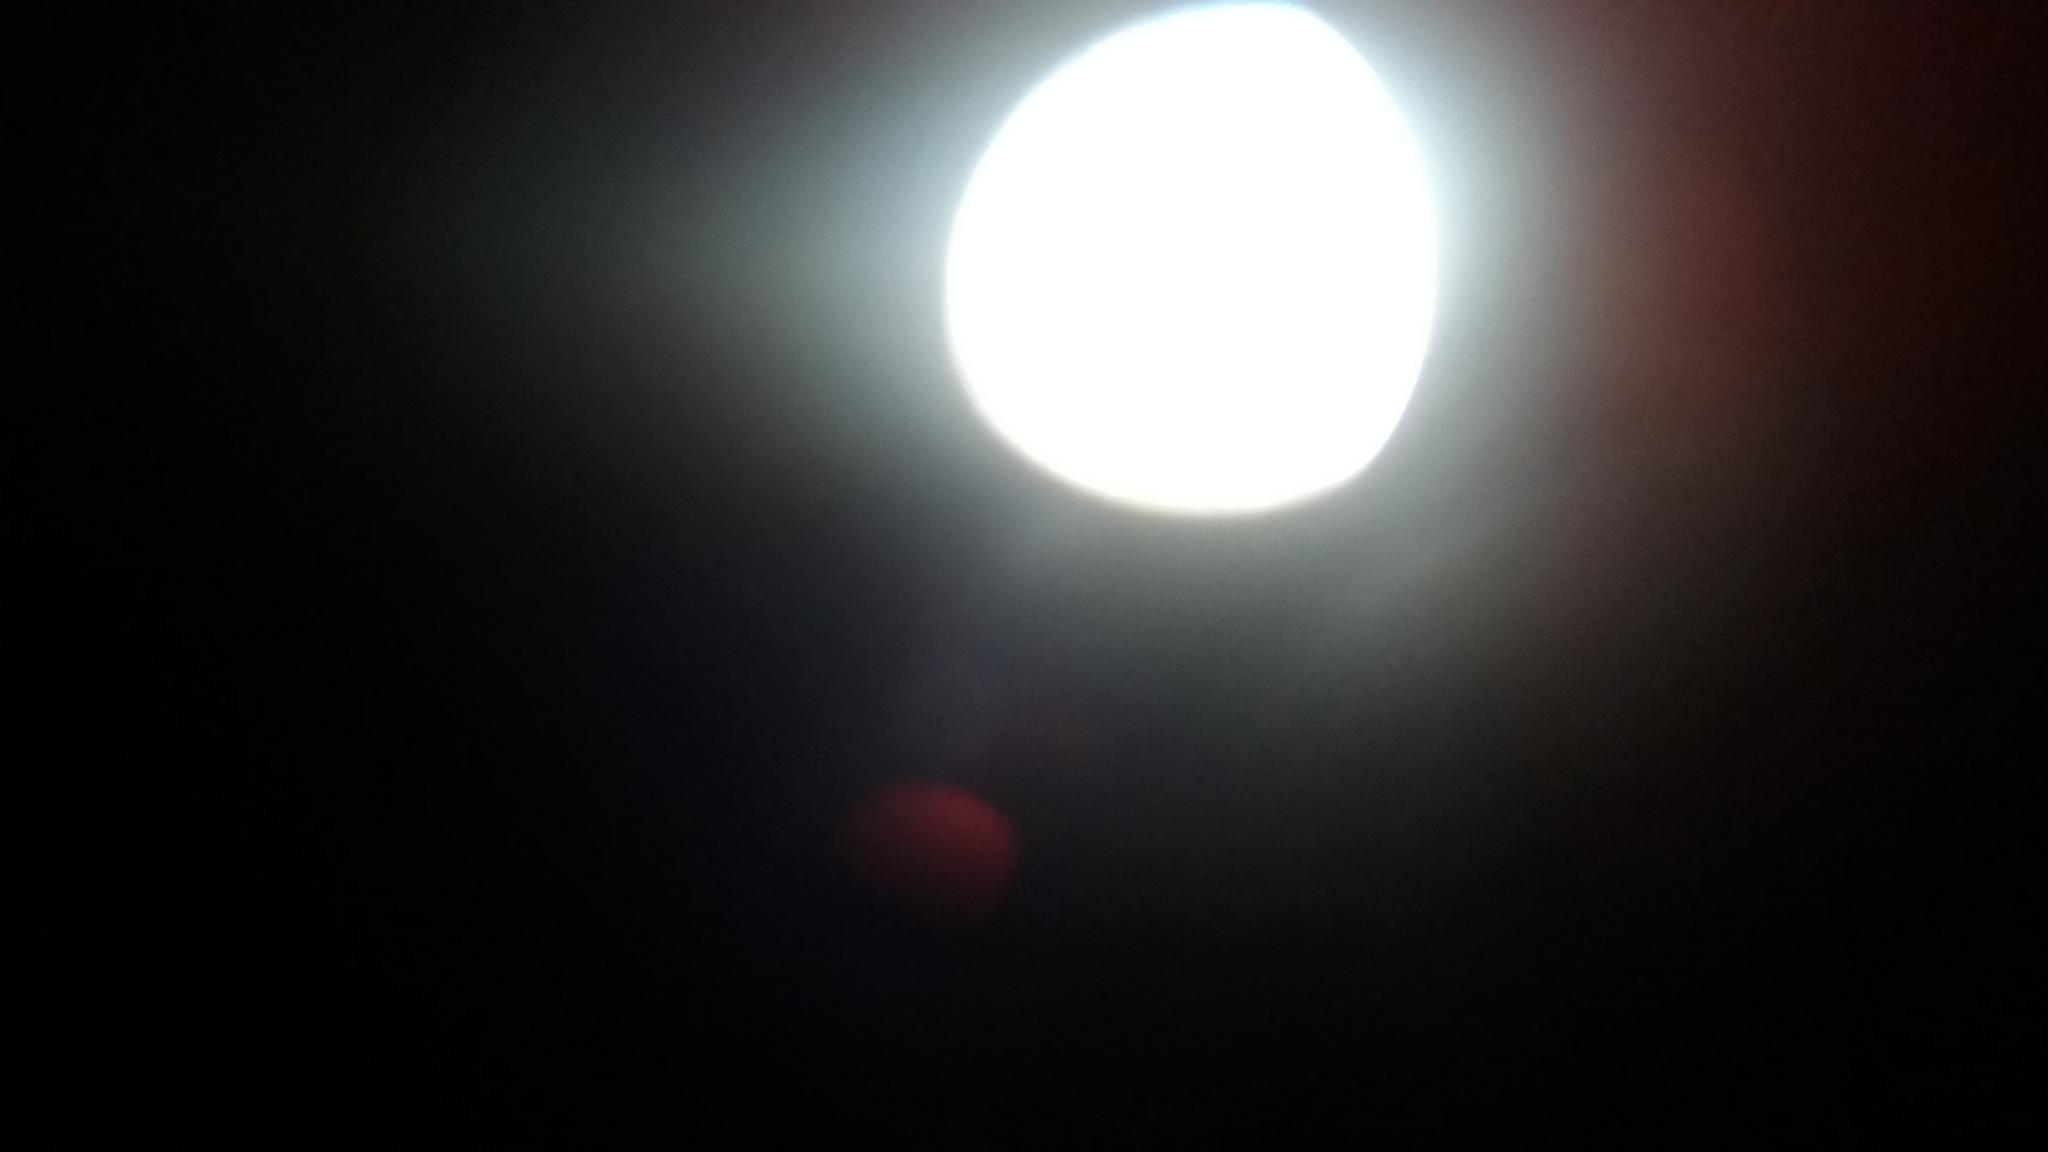 Recommend a telescope-20210526_183743-jpg